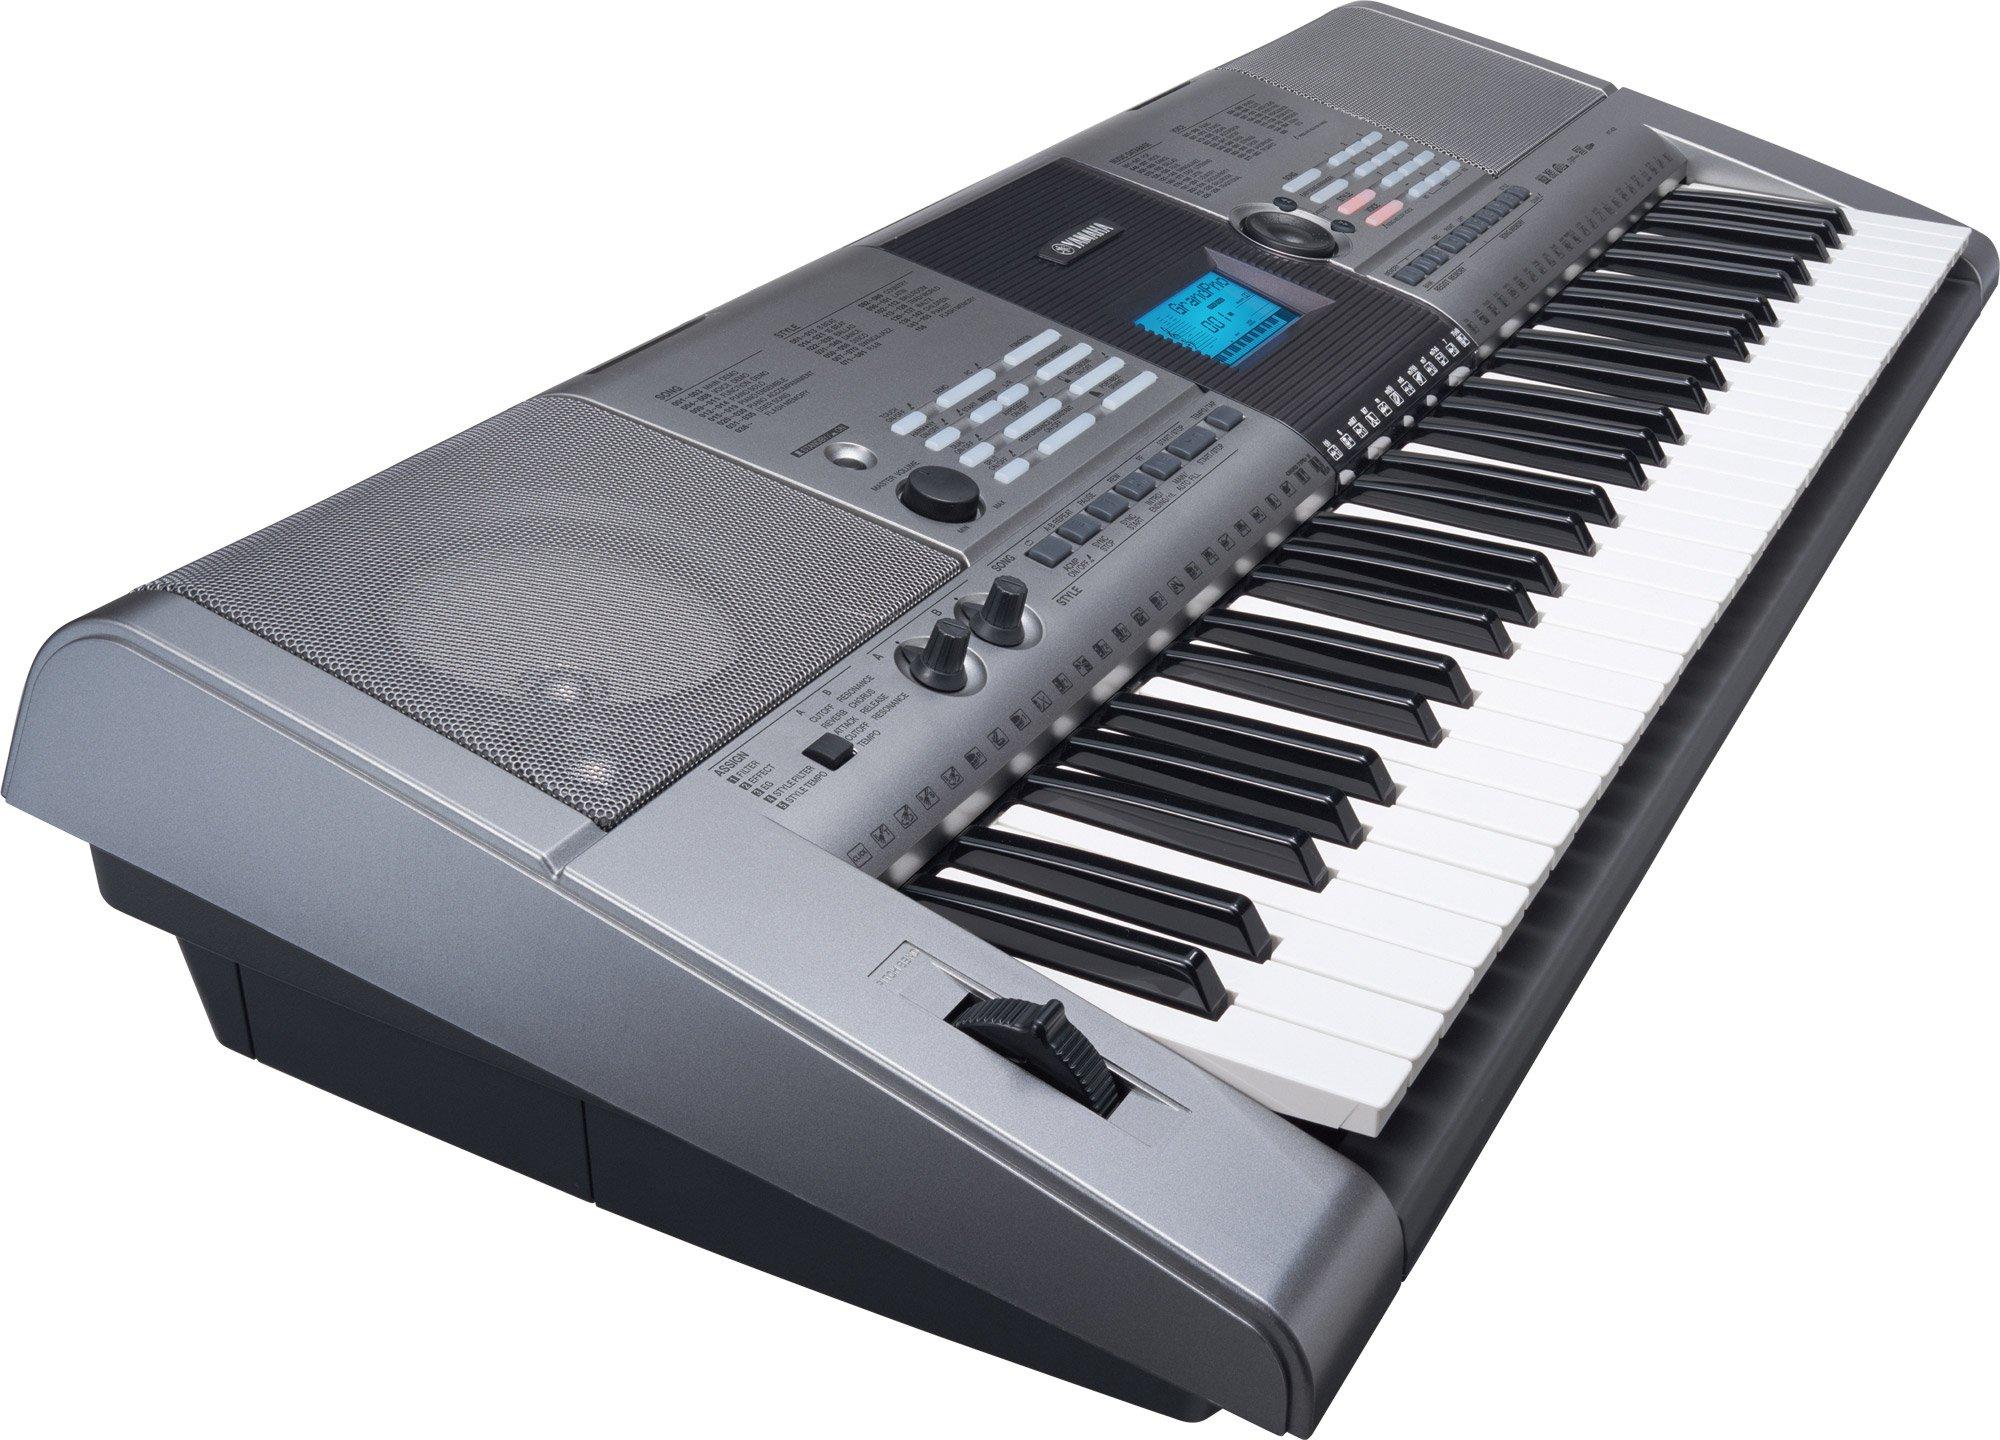 Image Result For Yamaha Keyboard I